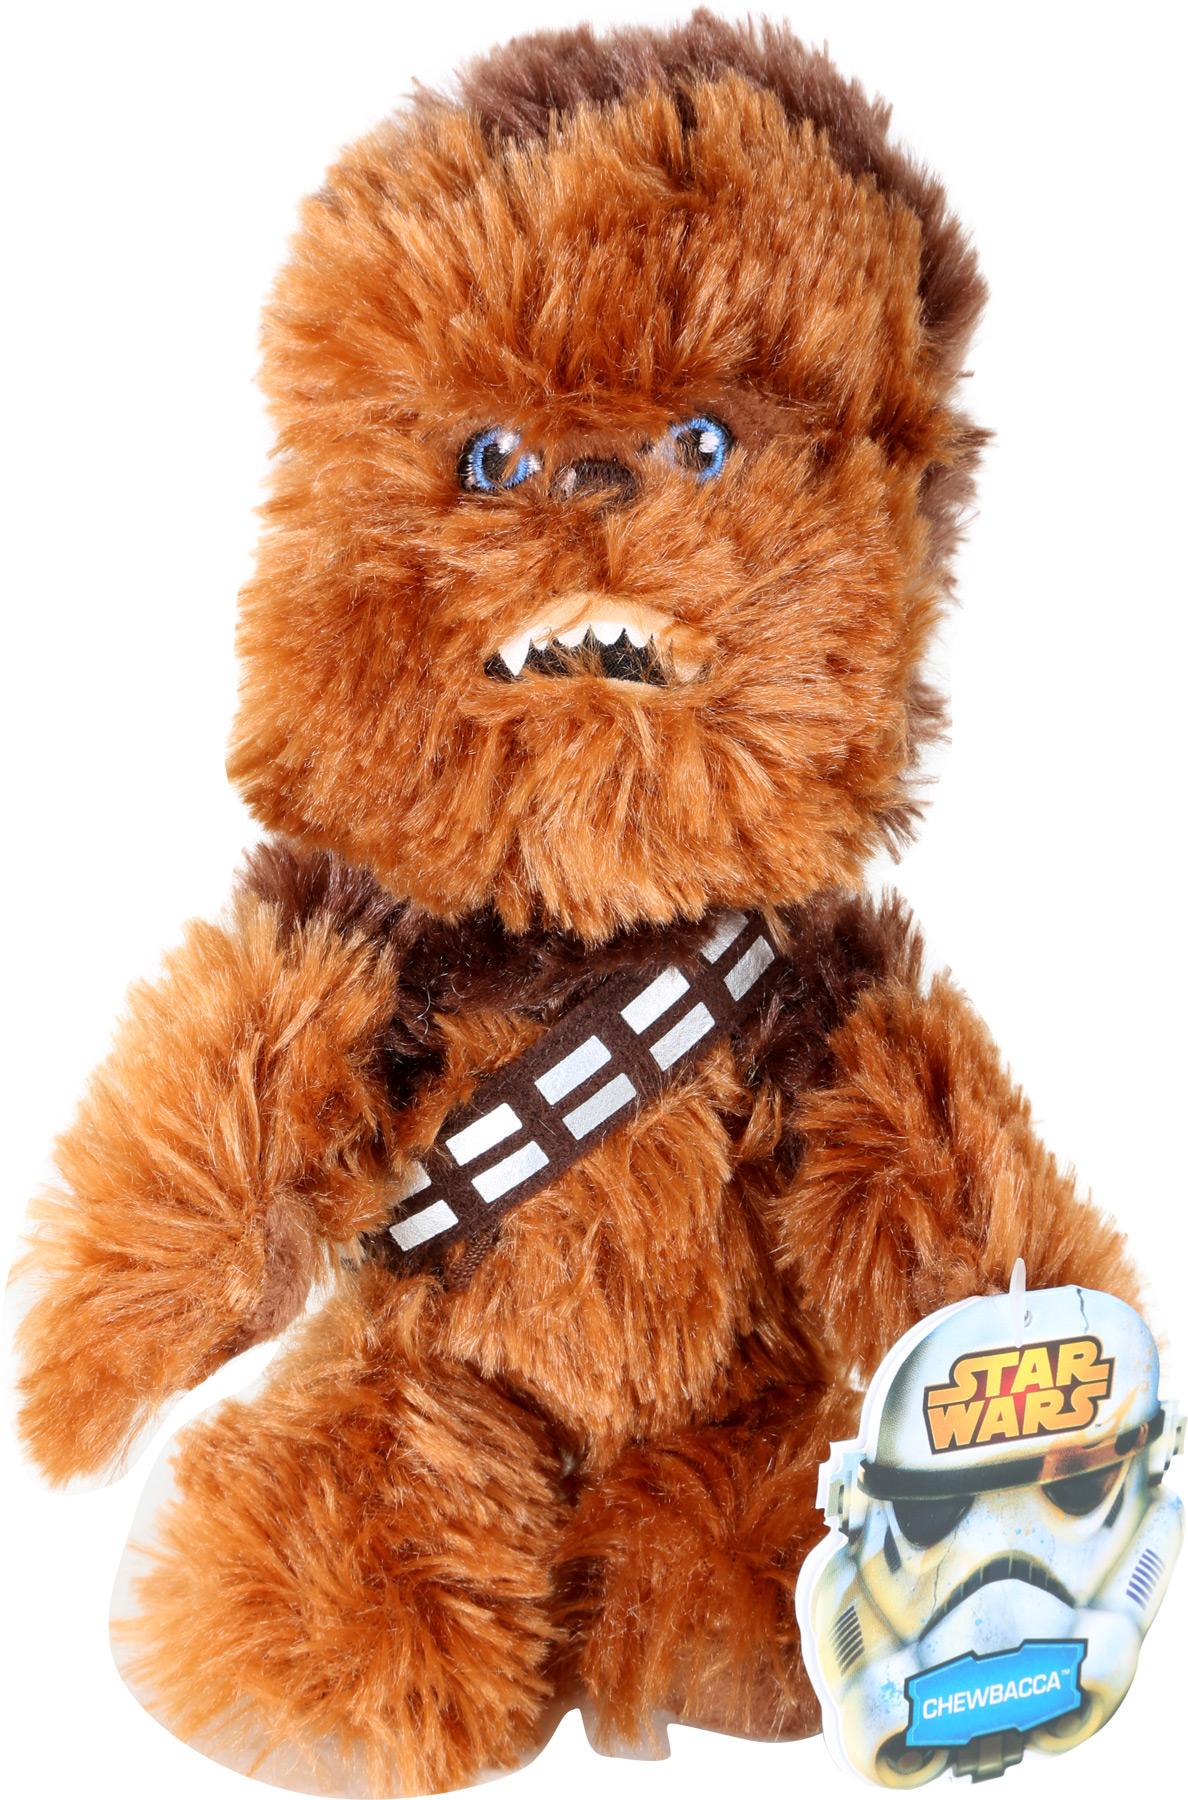 Small Foot Star Wars plyšový Chewbacca